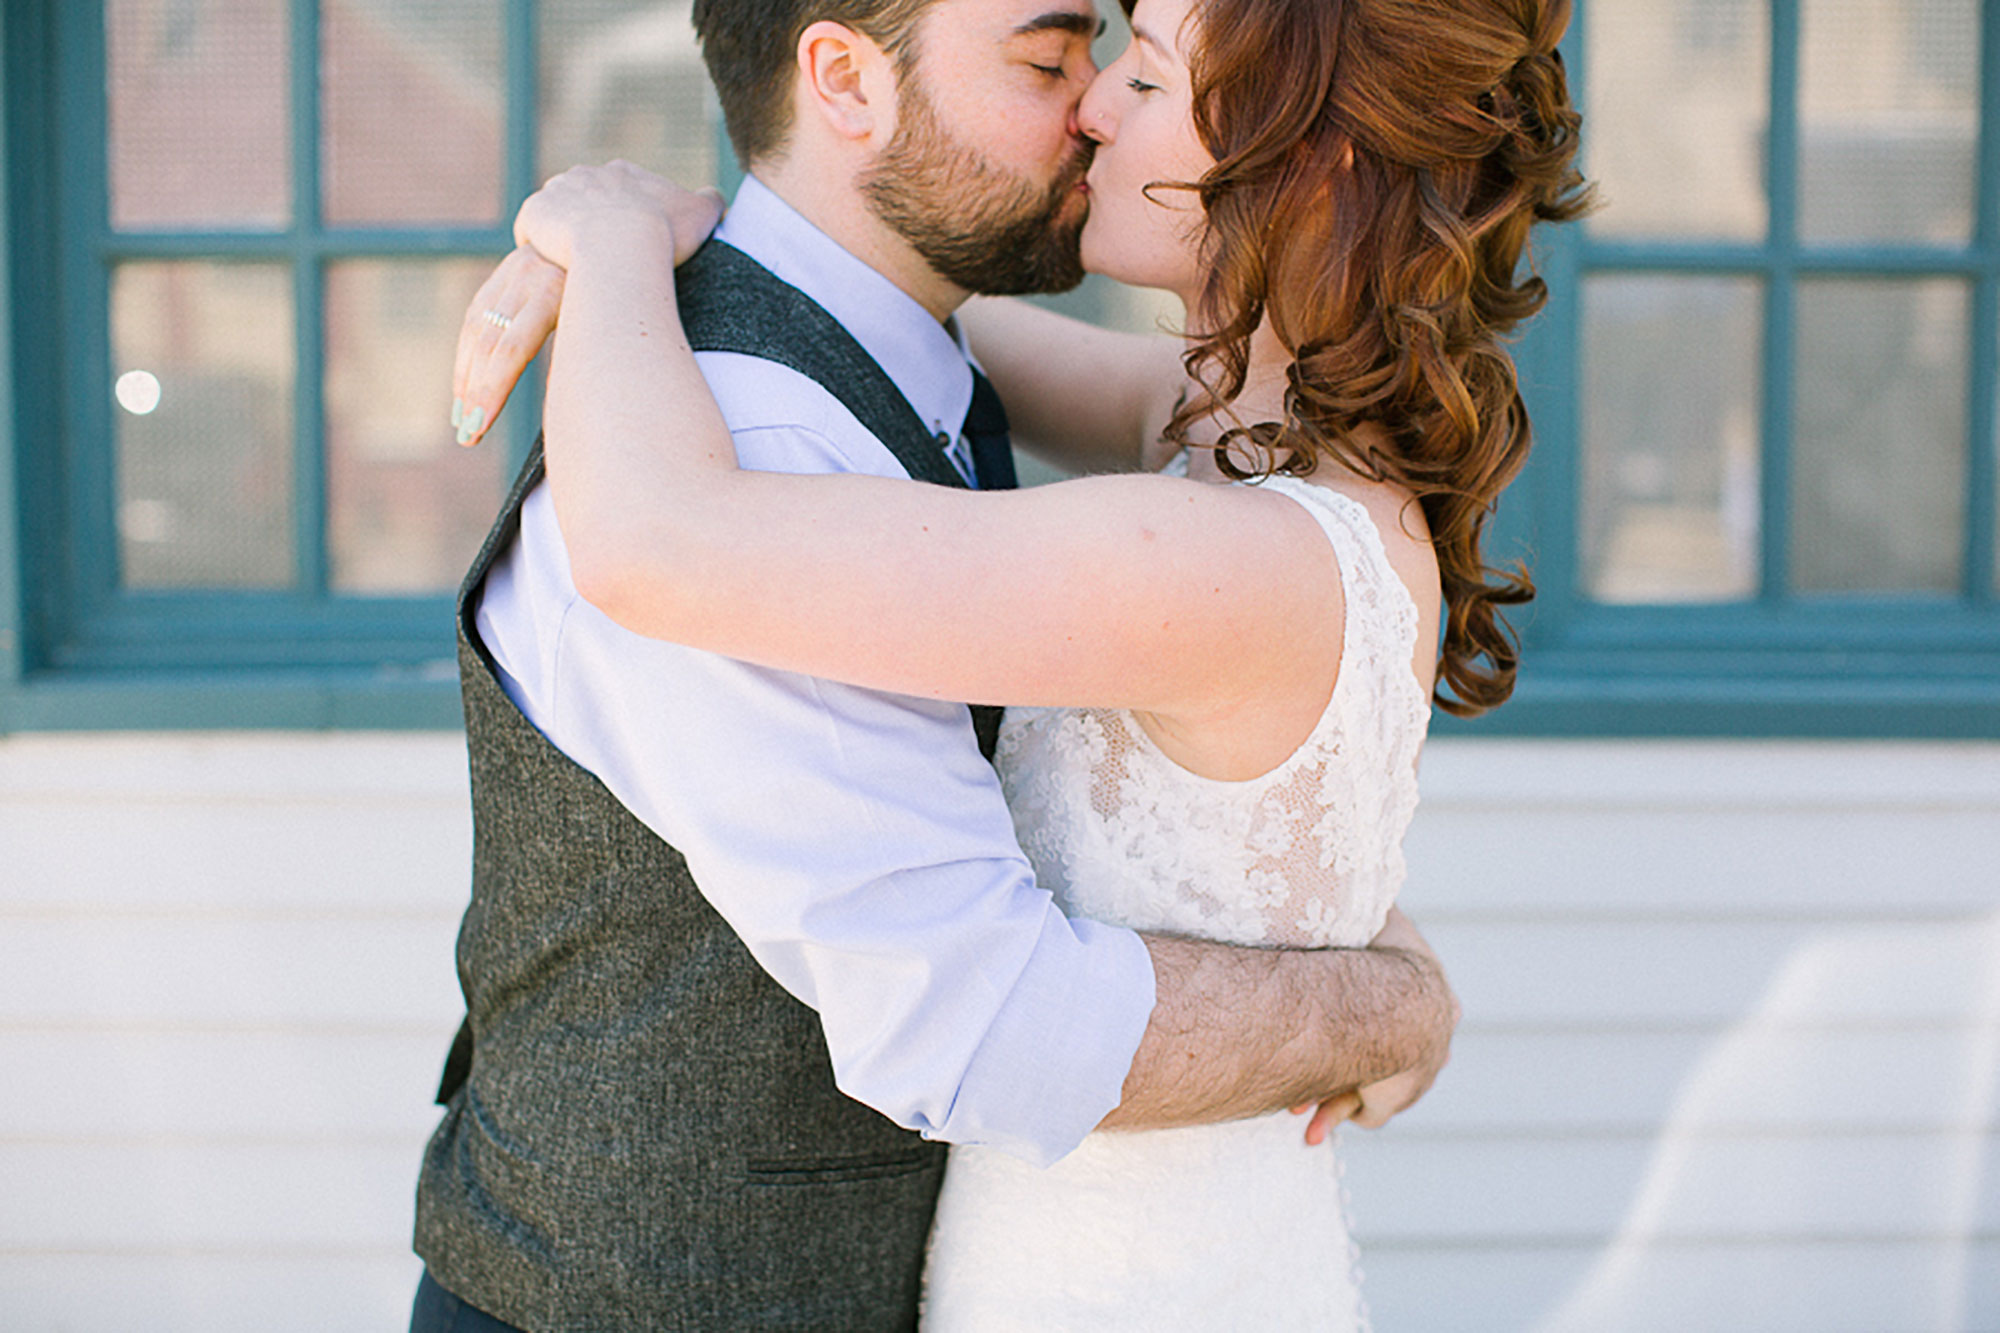 Navy-Hall-Wedding-Vineyard-Bride-Photo-By-Andrew-Mark-Photography-010.jpg